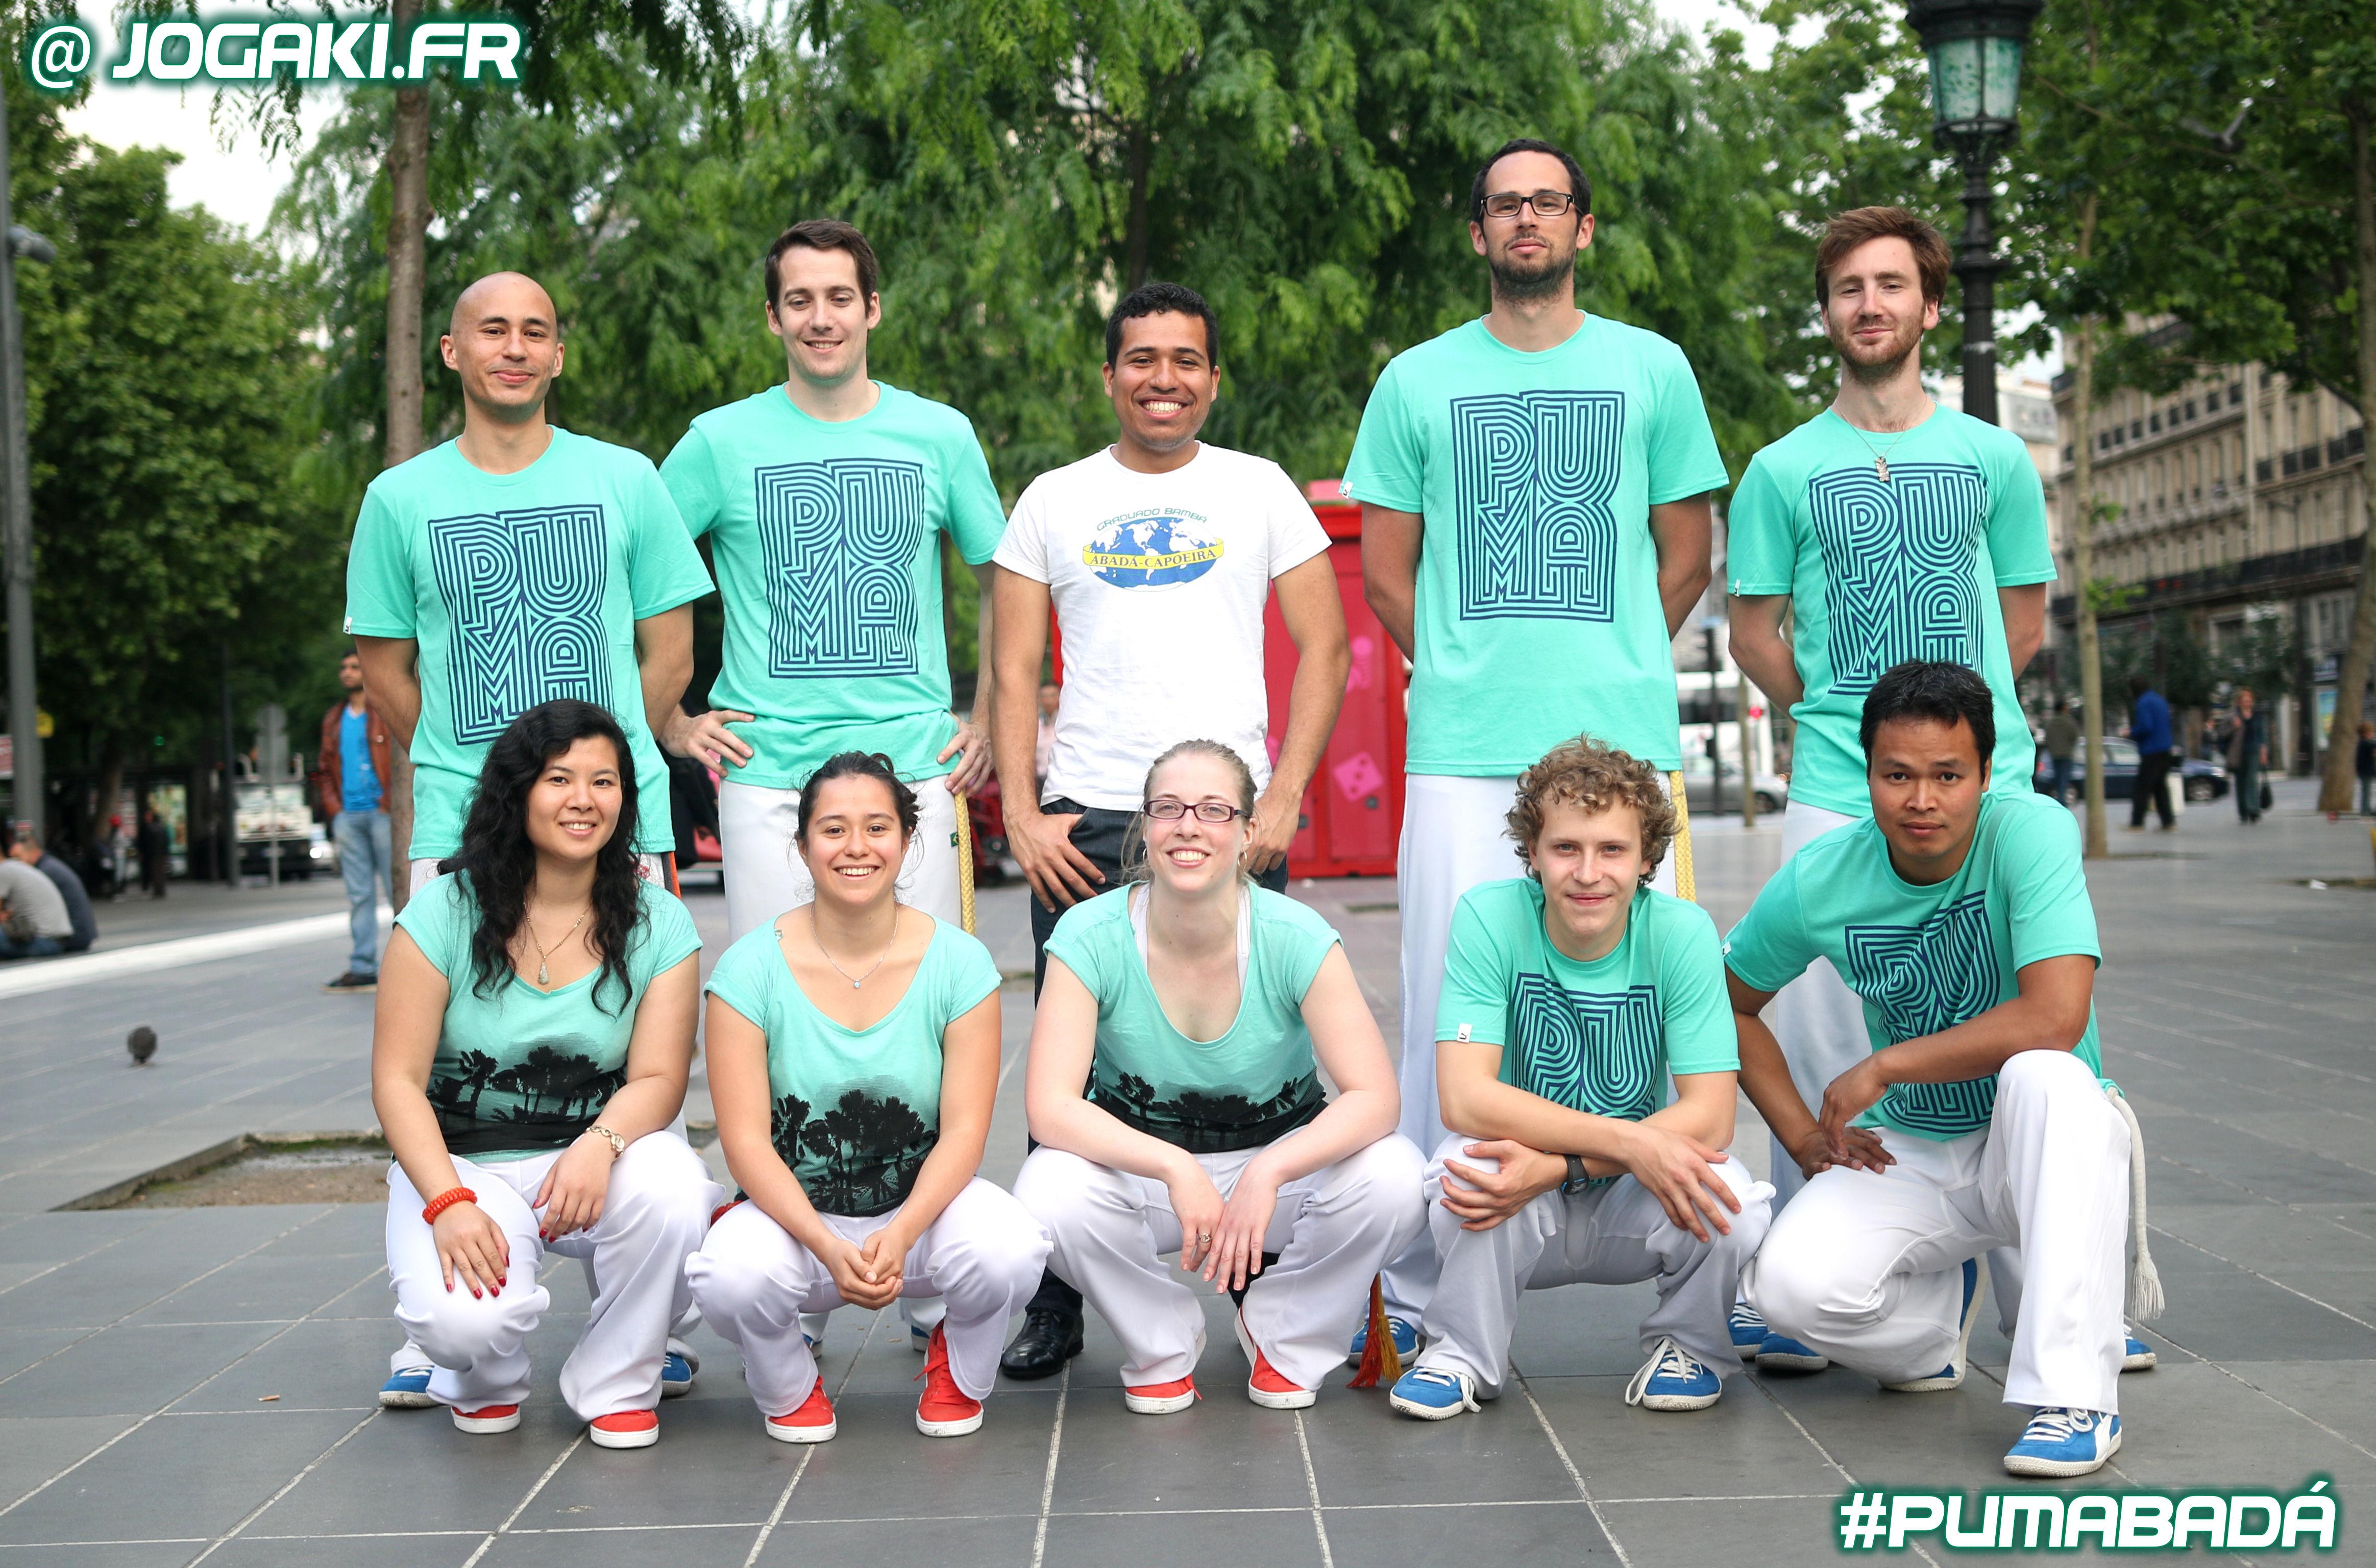 capoeira-paris-jogaki-puma-groupe-portrait